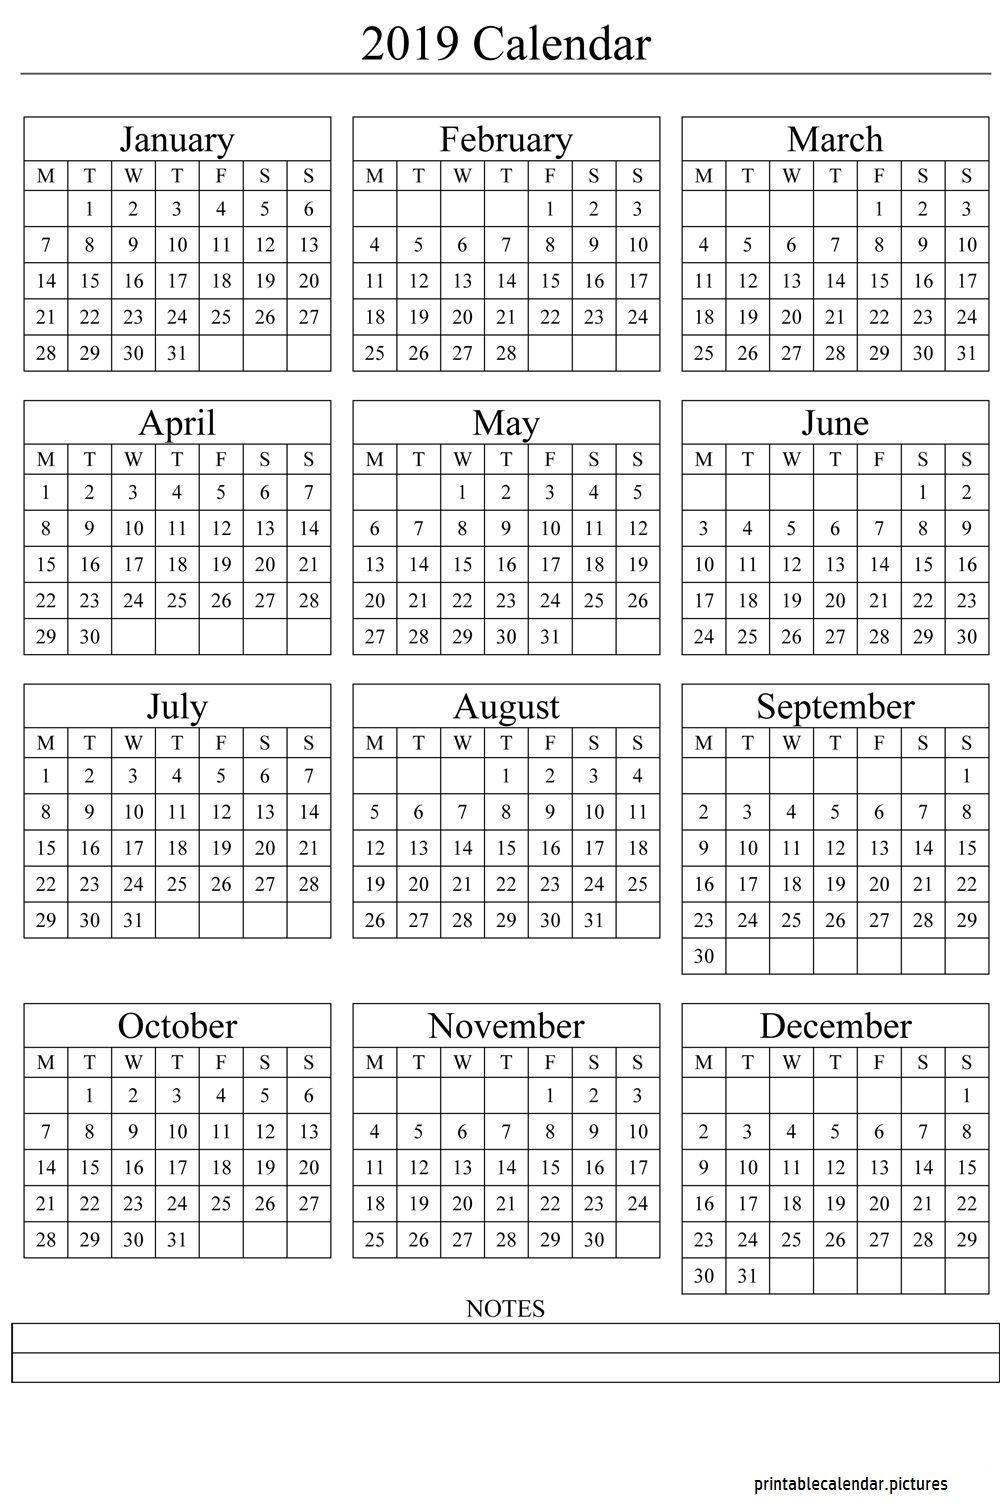 Printable 2019 Yearly Calendar Templates Us Edition